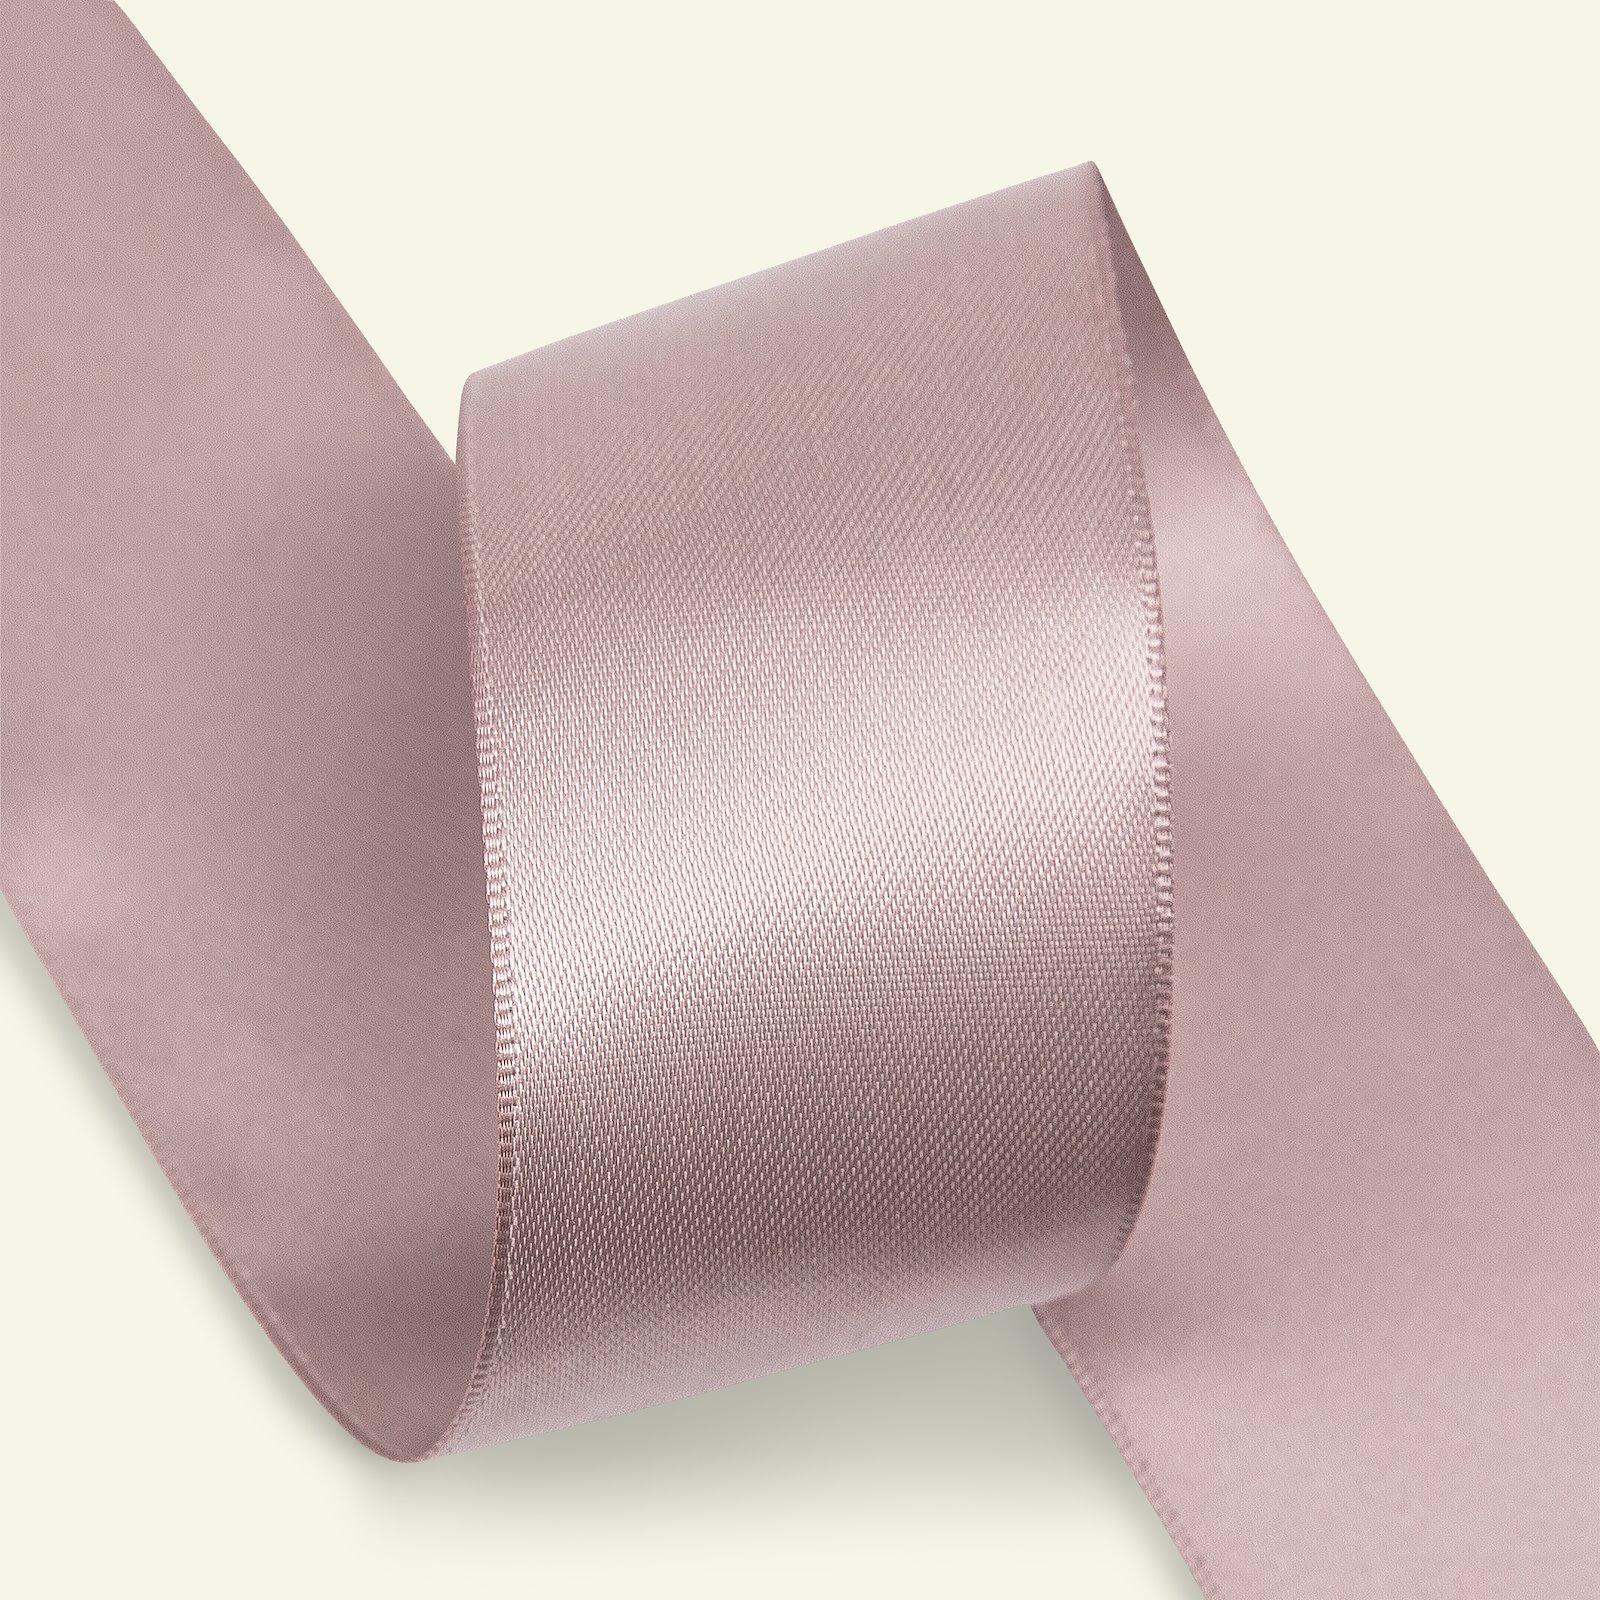 Satin ribbon 38mm light heather 25m 27577_pack